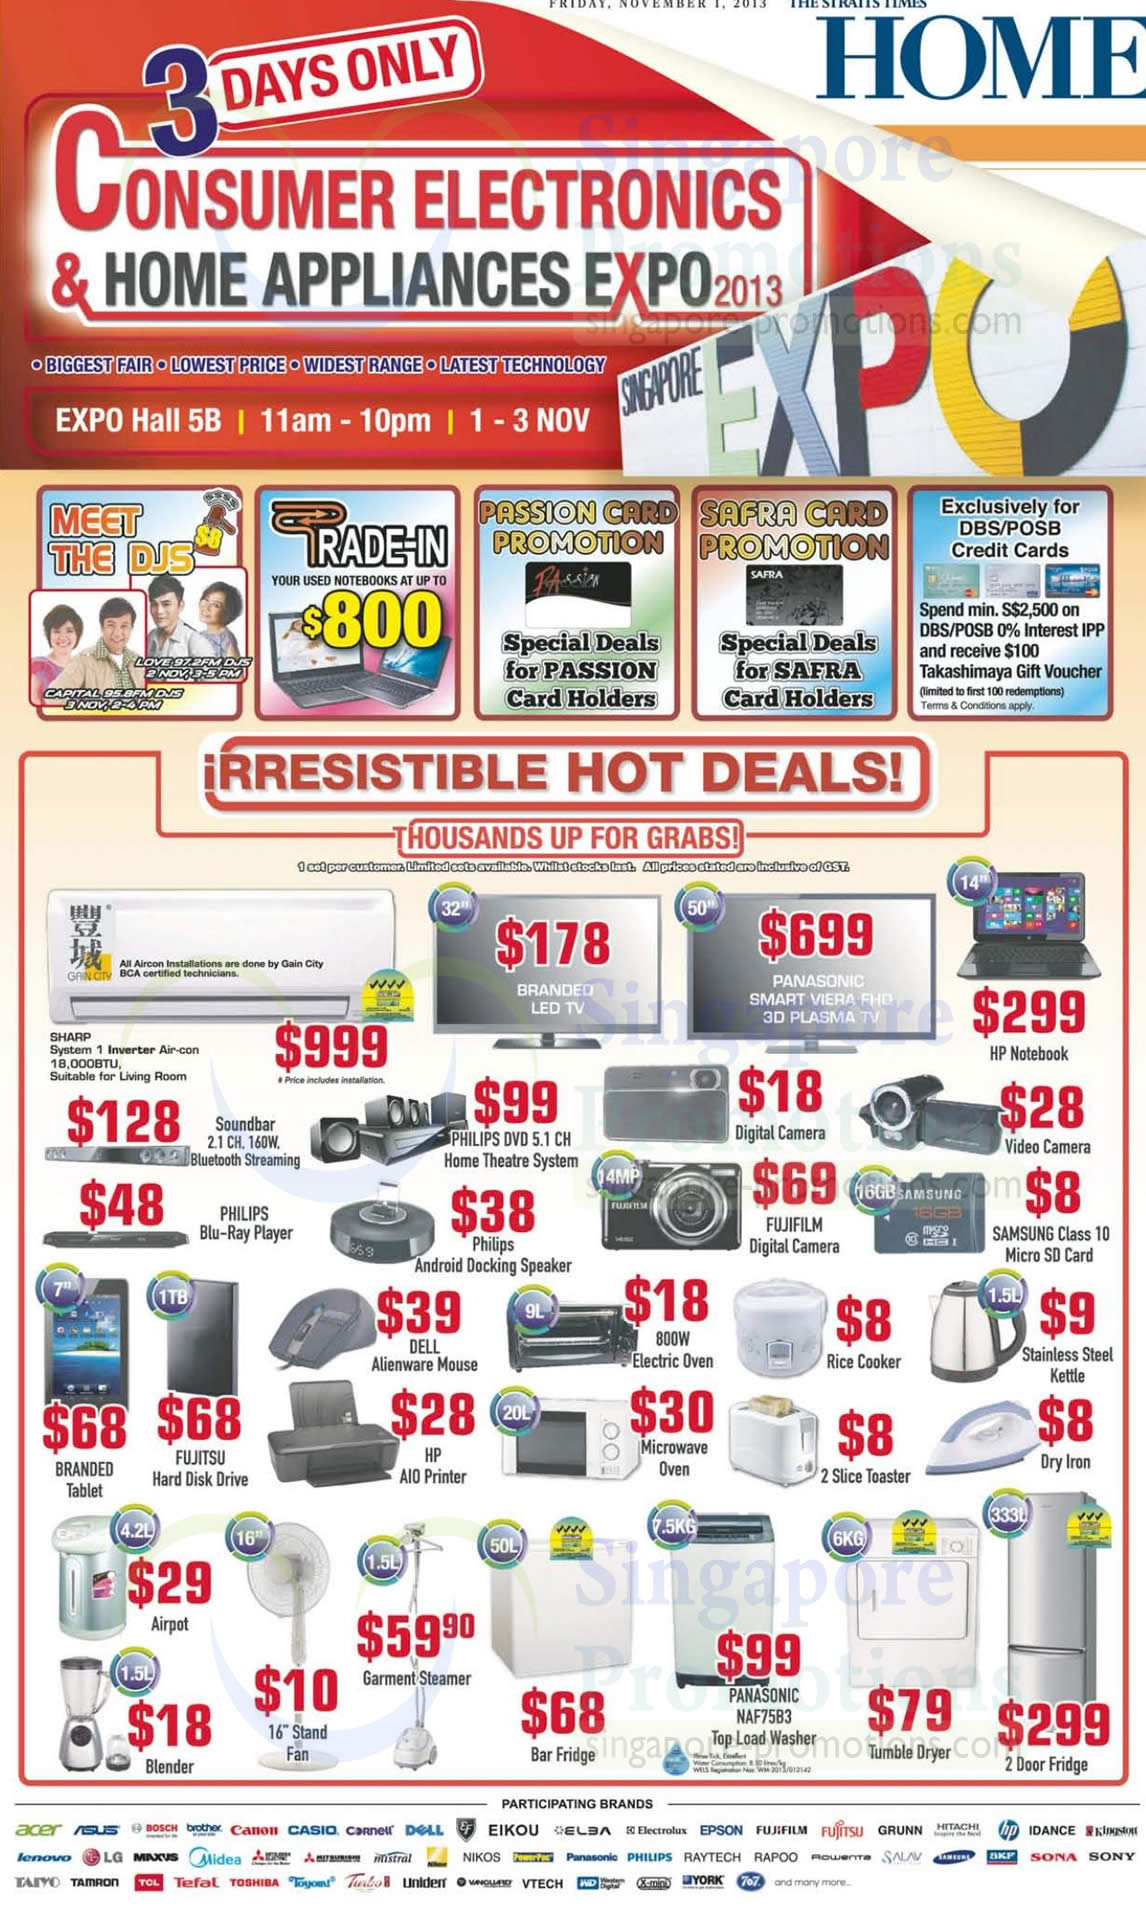 1 Nov Hot Deals Air Condiitoner, Washer, Fridge, Notebook, Electronics